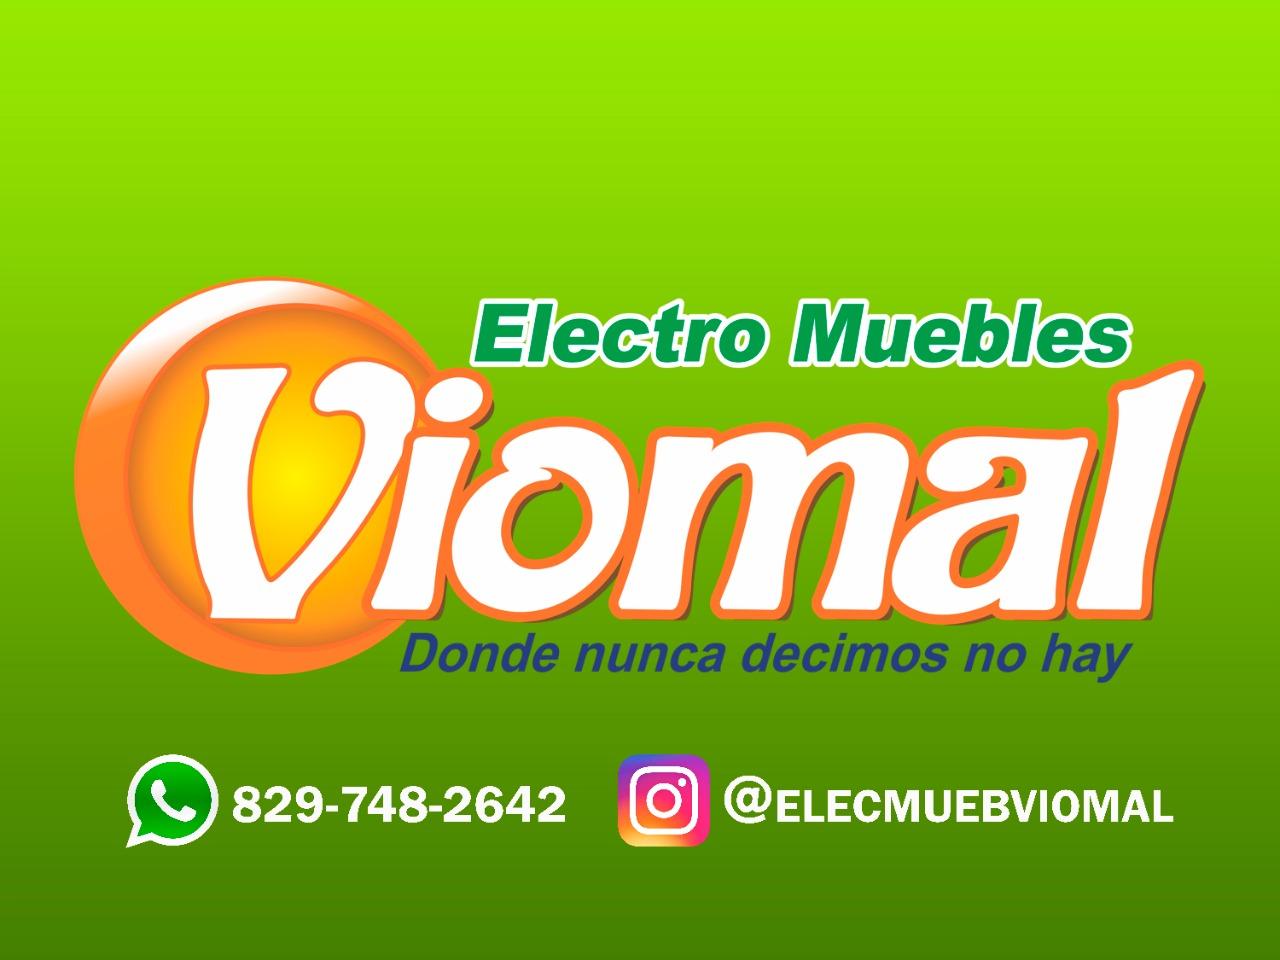 Anuncio Viomal 320x240